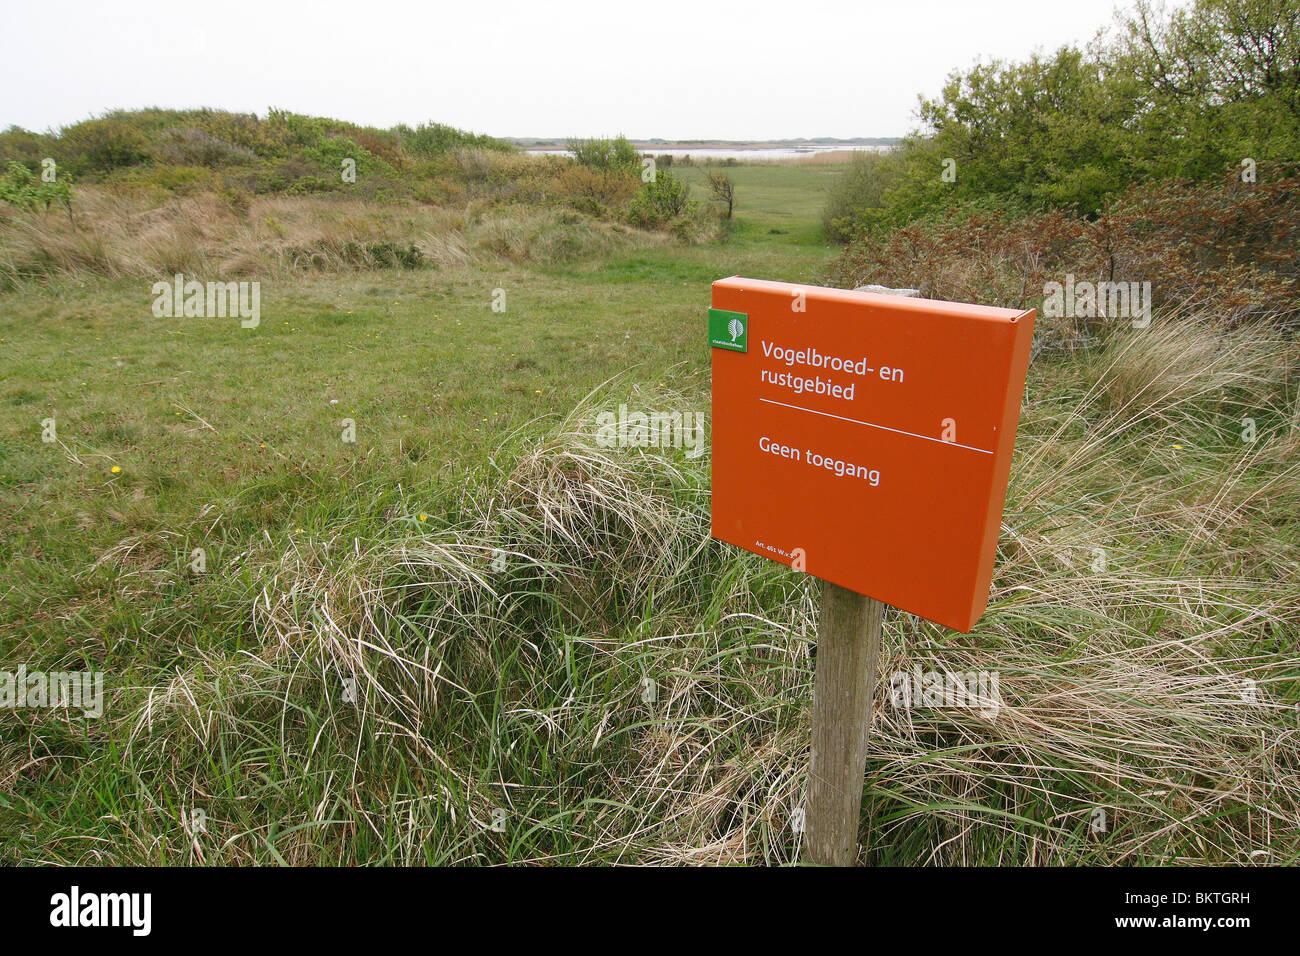 Bord van Staatsbosbeheer met tekst vogelbroedgebied en rustgebied, geen toegang - Stock Image